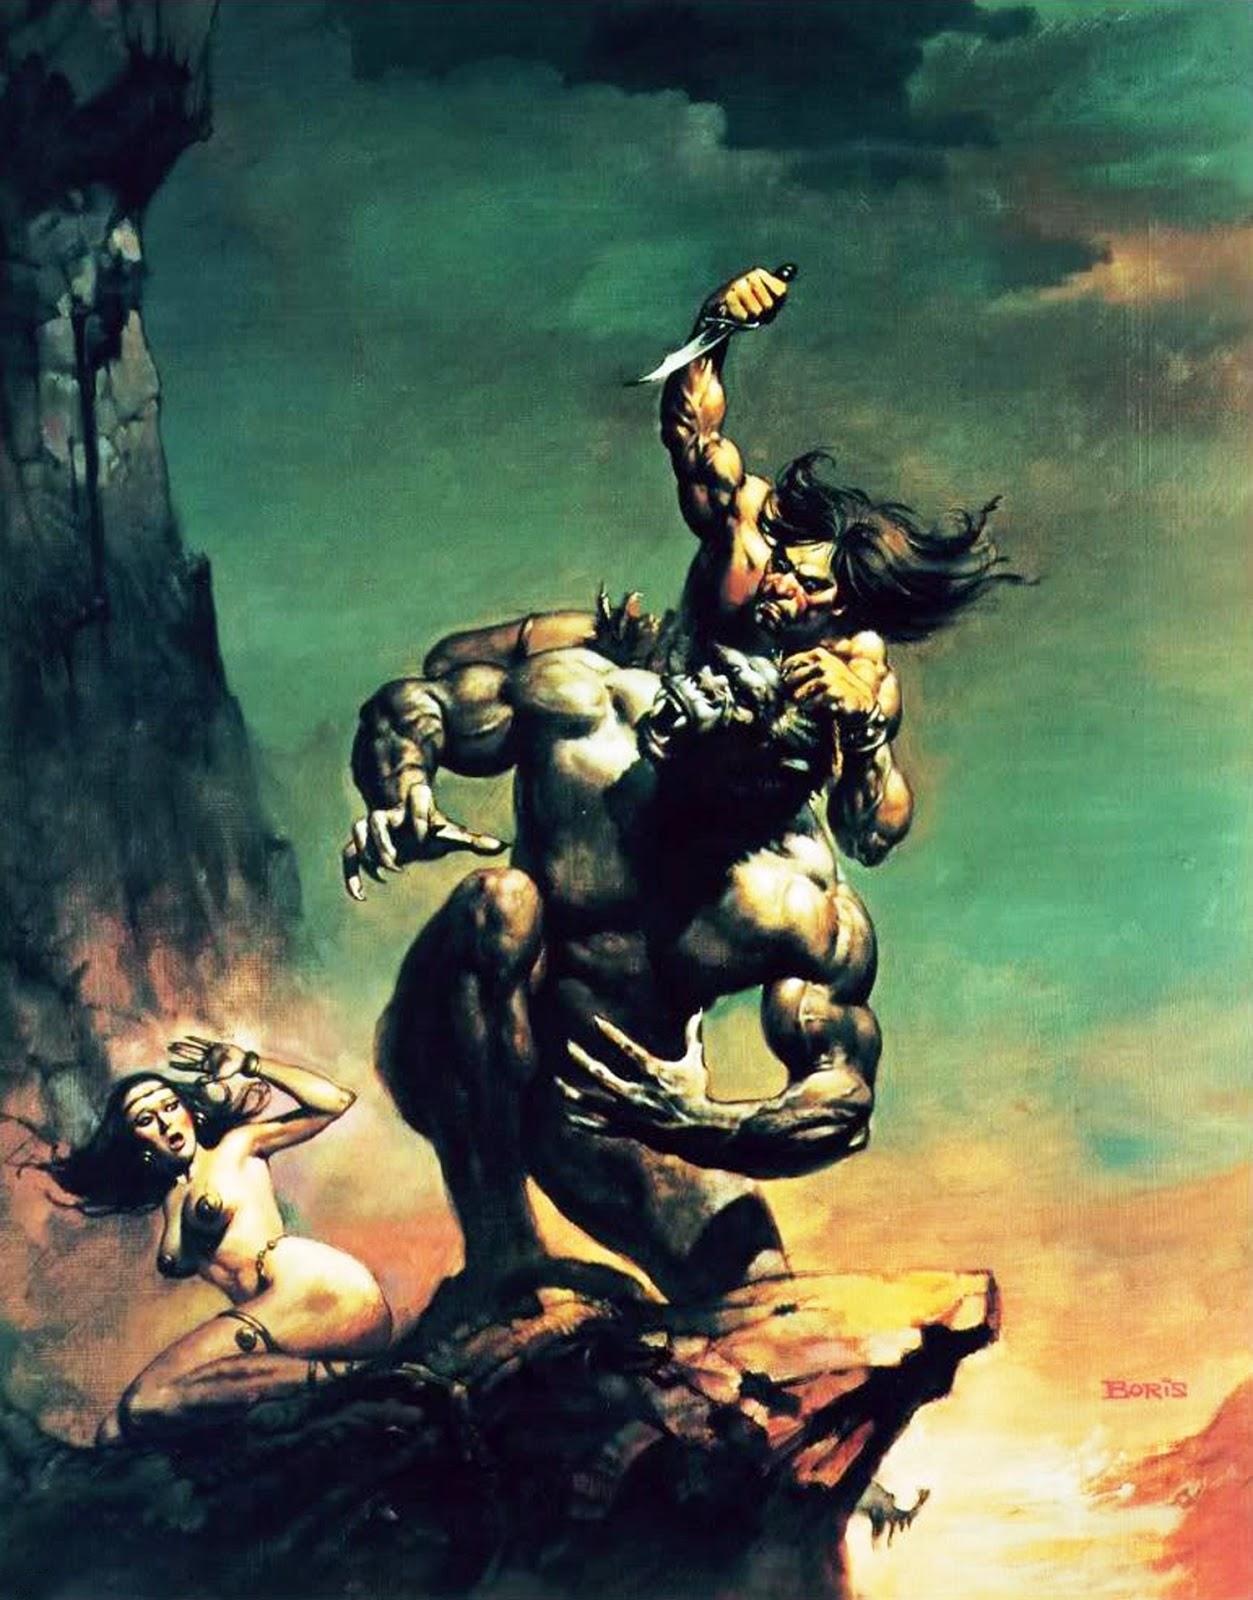 Savage_Sword_of_Conan_Vol_1_4_Original_Art